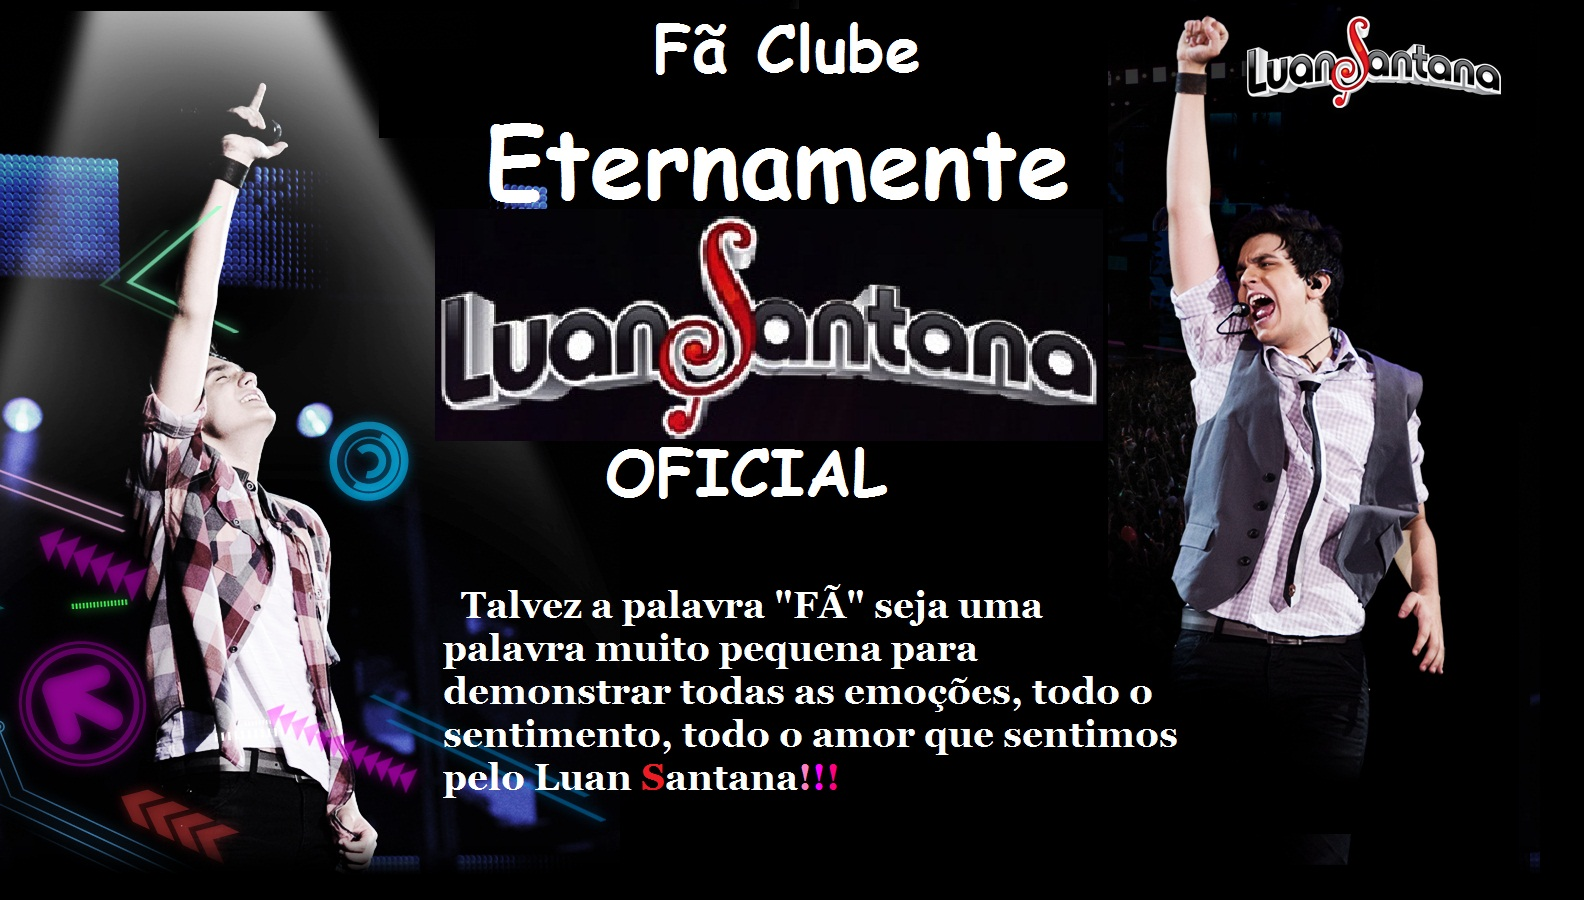 Fc Eternamente Luan Santana OFICIAL